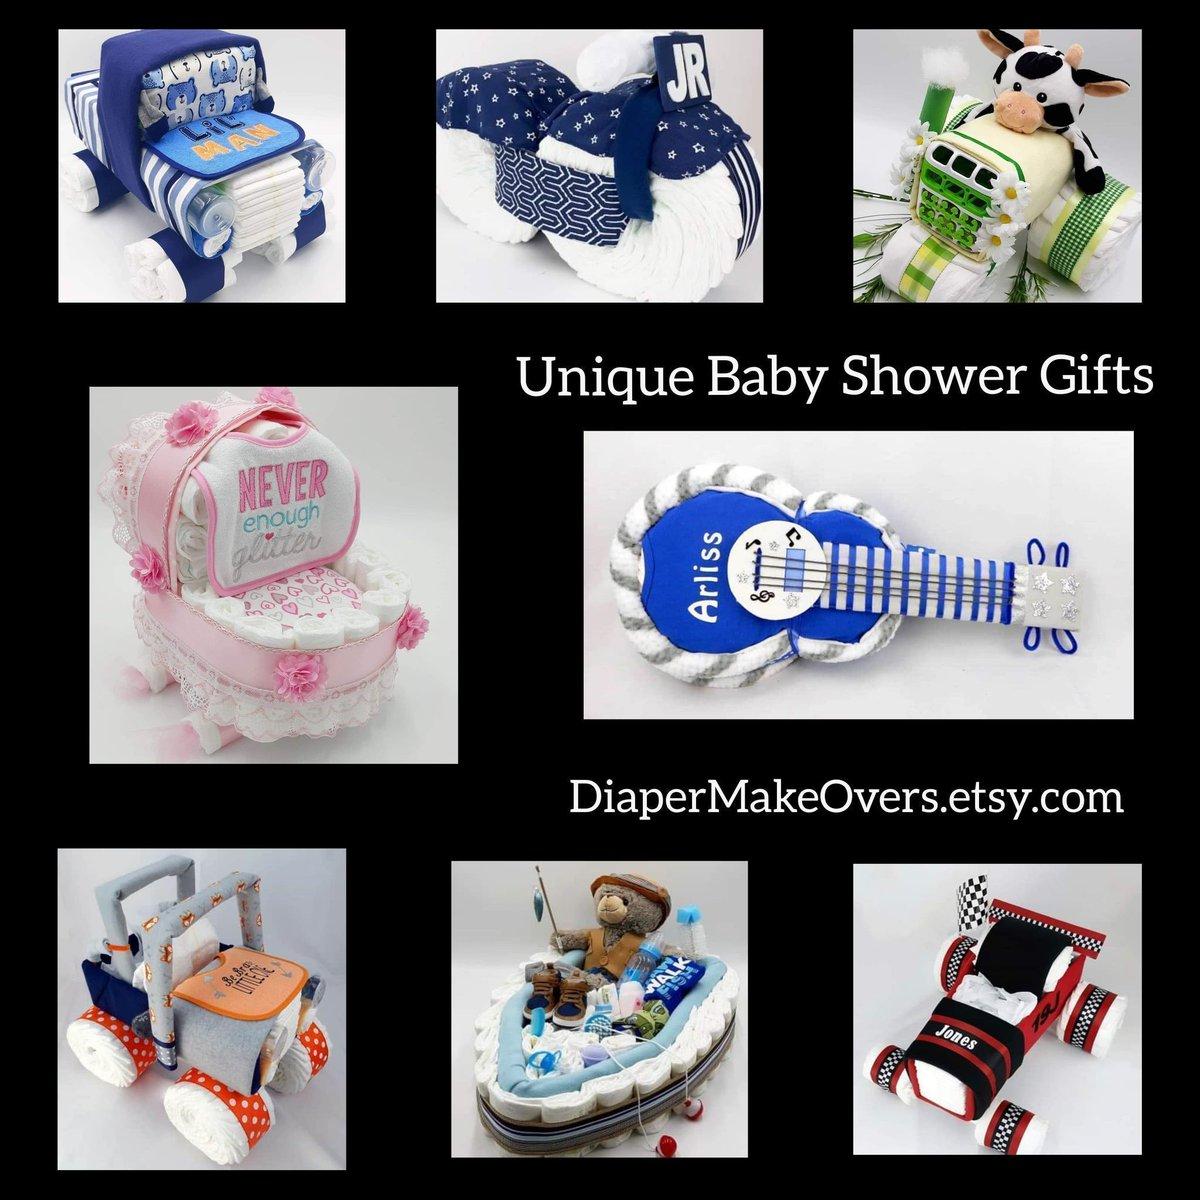 #epiconetsy #babytrends #handmade #etsyshop #giftsforbaby #babyshowergifts #onlineshopping #craftshout #diapercake #babyshower #shopsmall #crafthour #baby